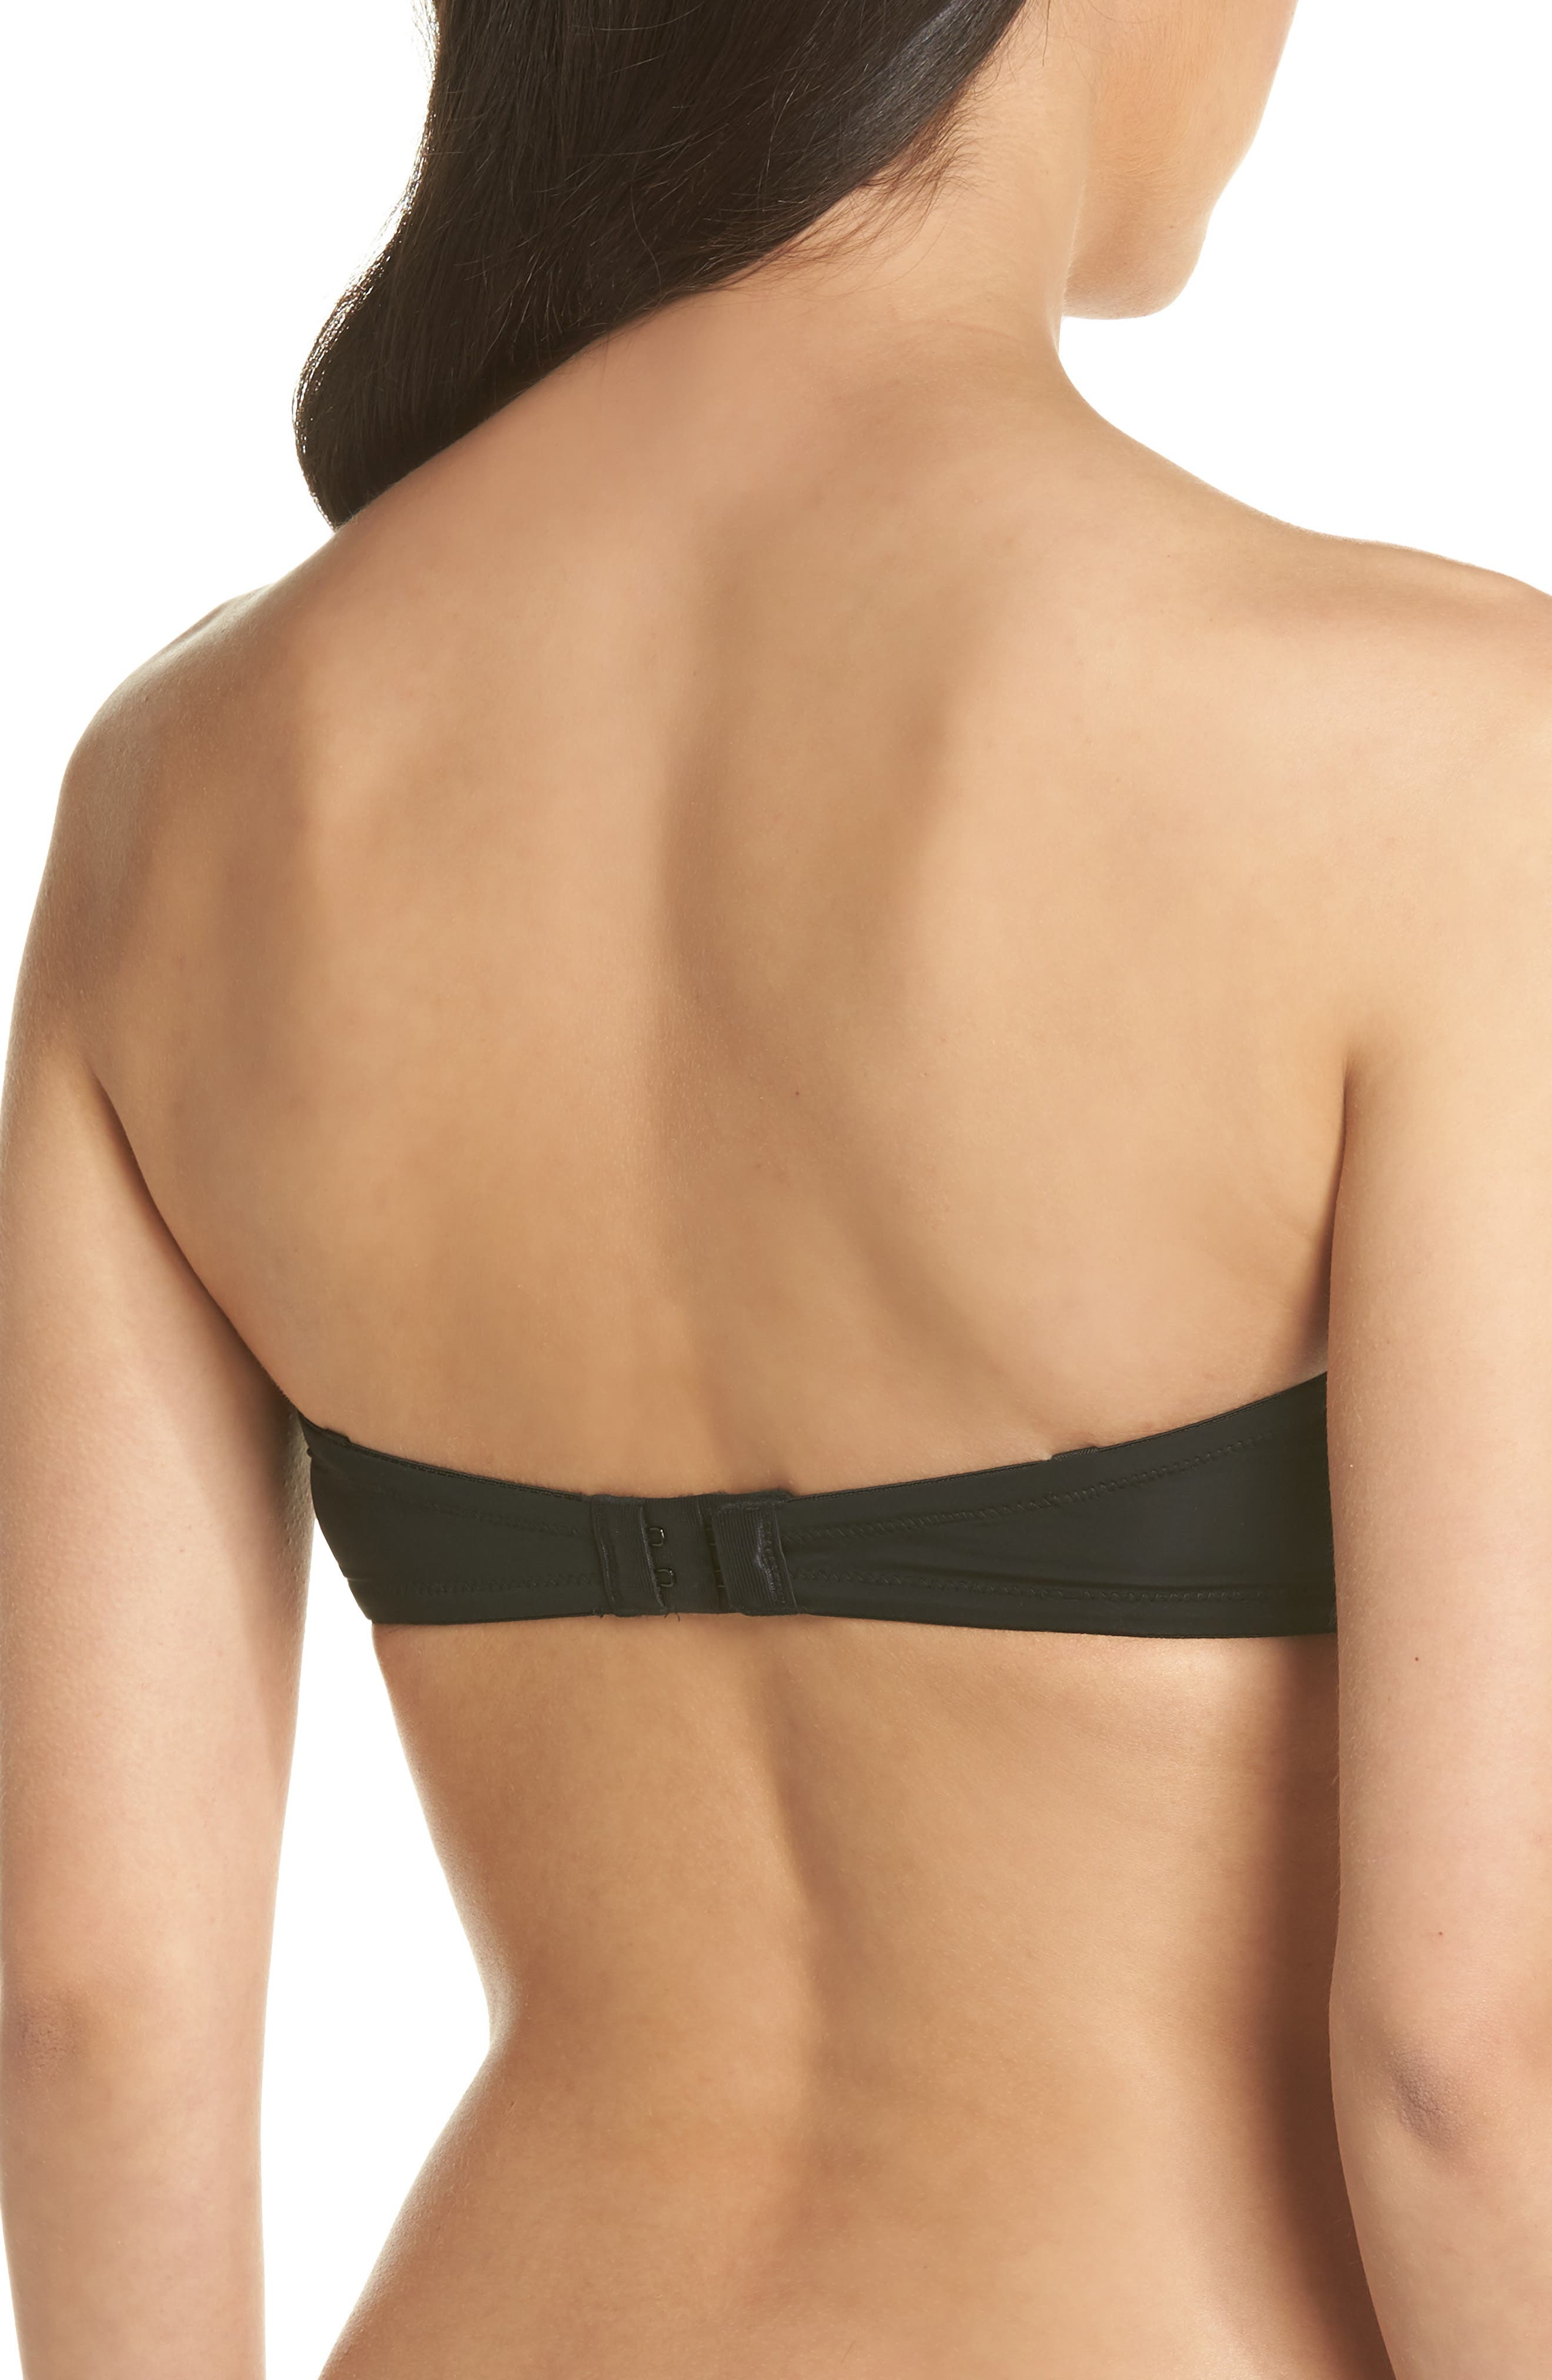 'Naked Glamour' Convertible Strapless Push-Up Bra,                             Alternate thumbnail 2, color,                             BLACK